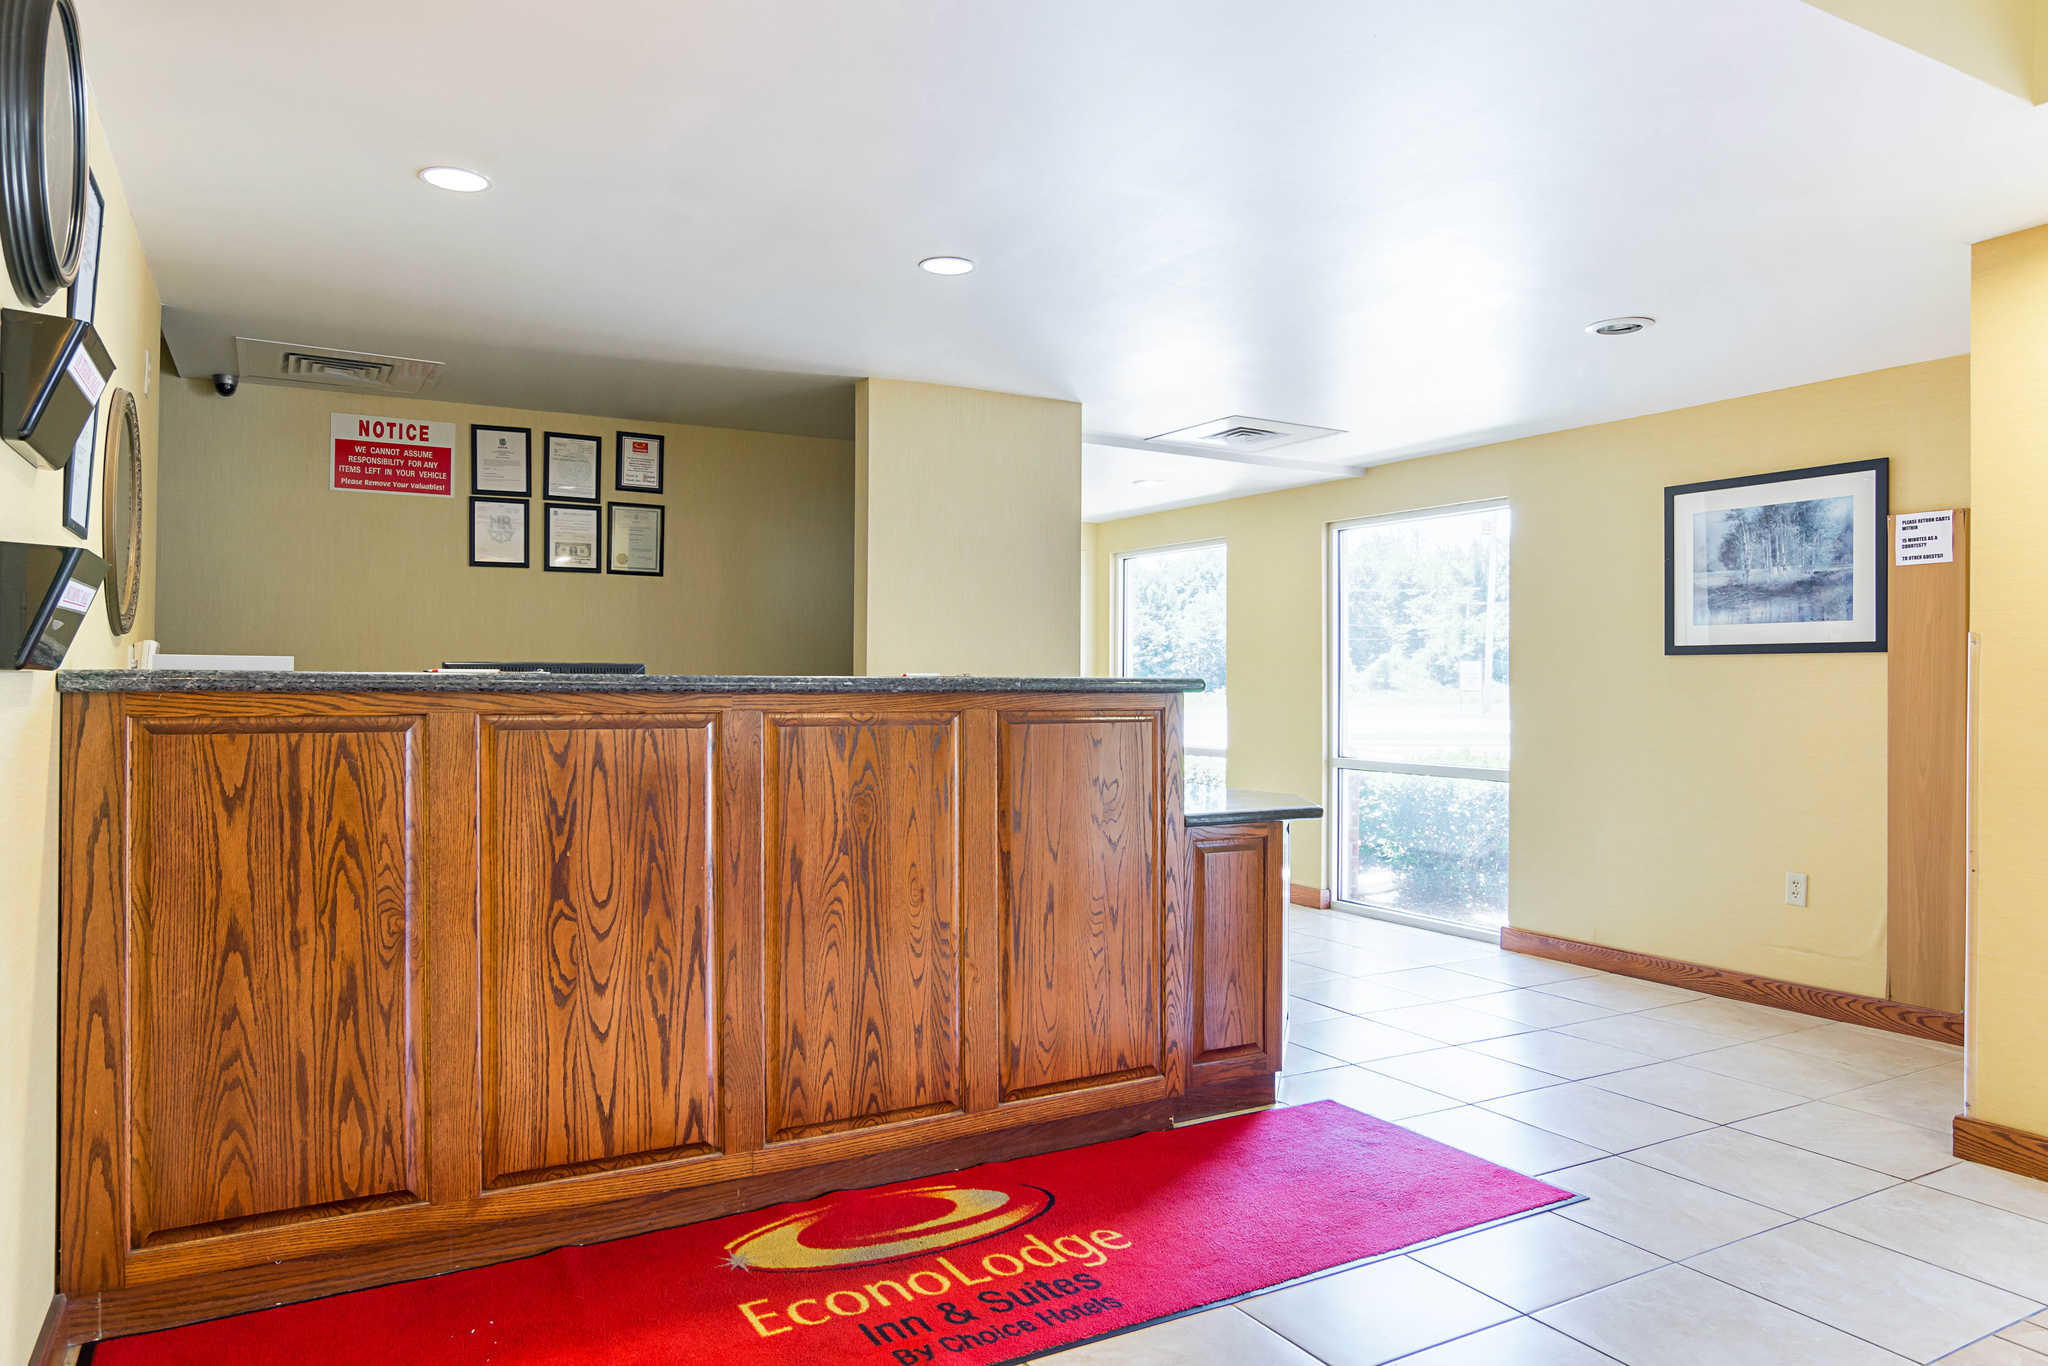 Econo Lodge Inn & Suites Pritchard Road North Little Rock image 23